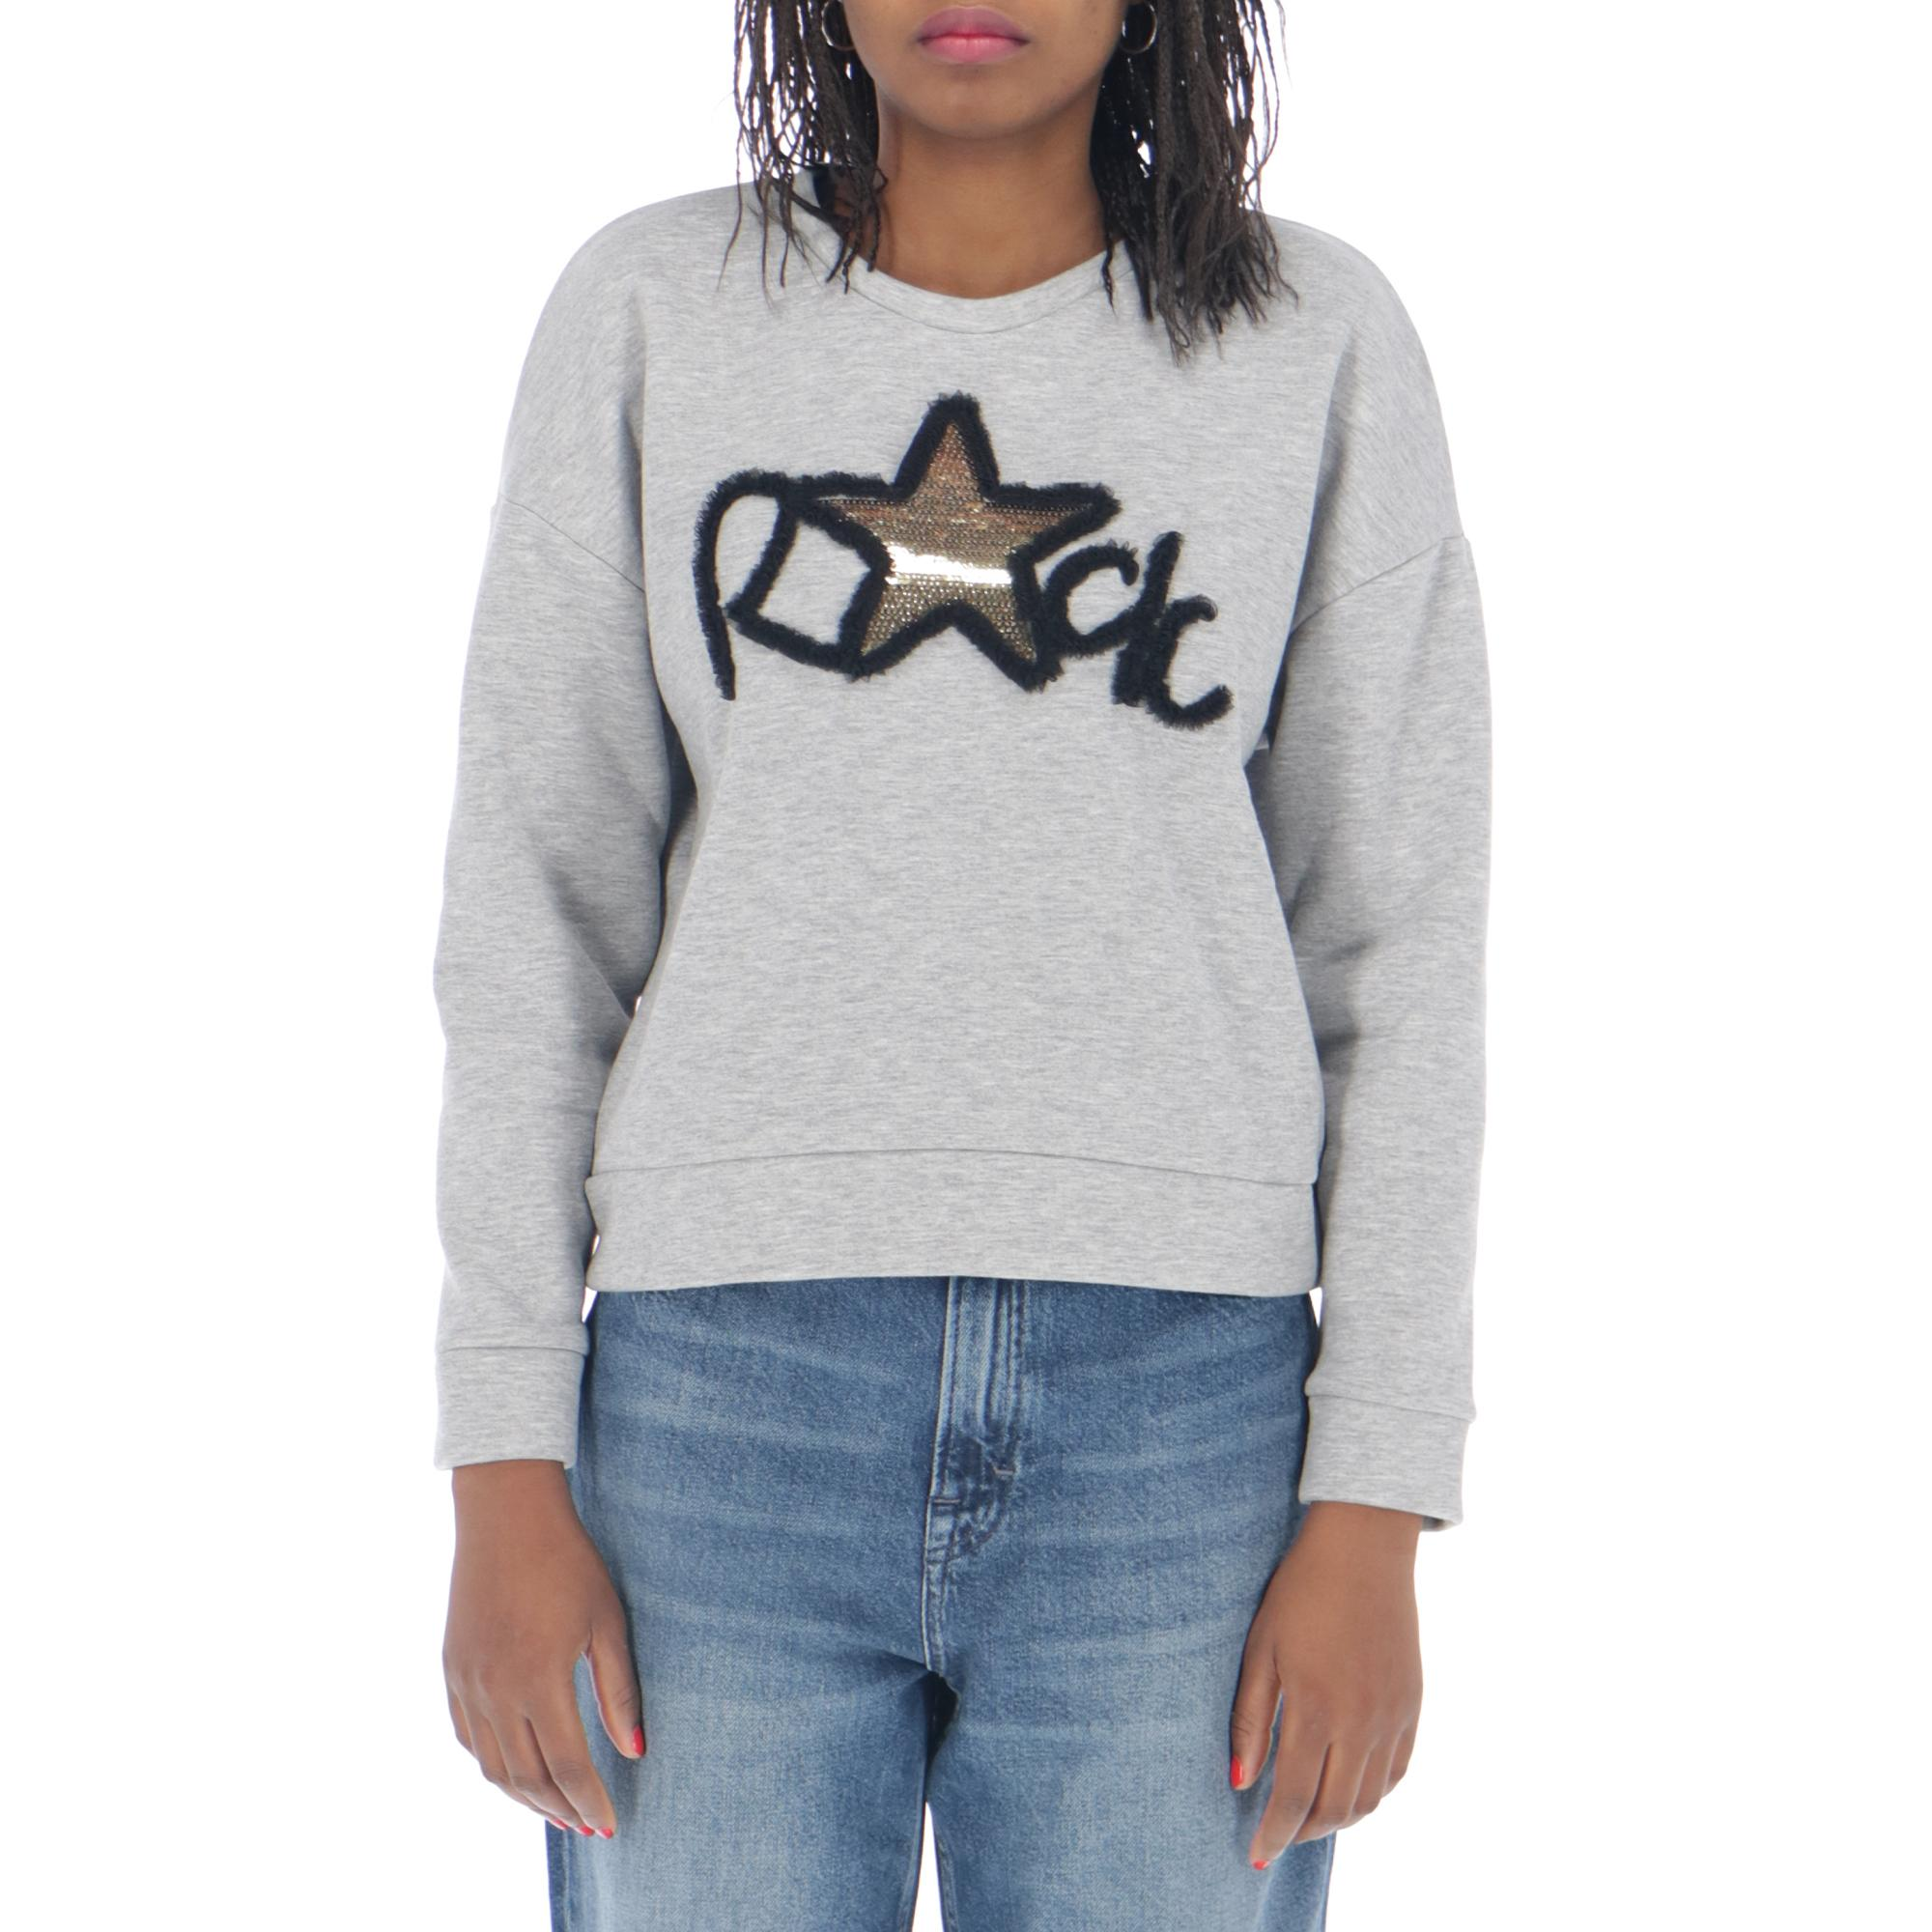 Only Love Rock Sweatshirt Light grey melange